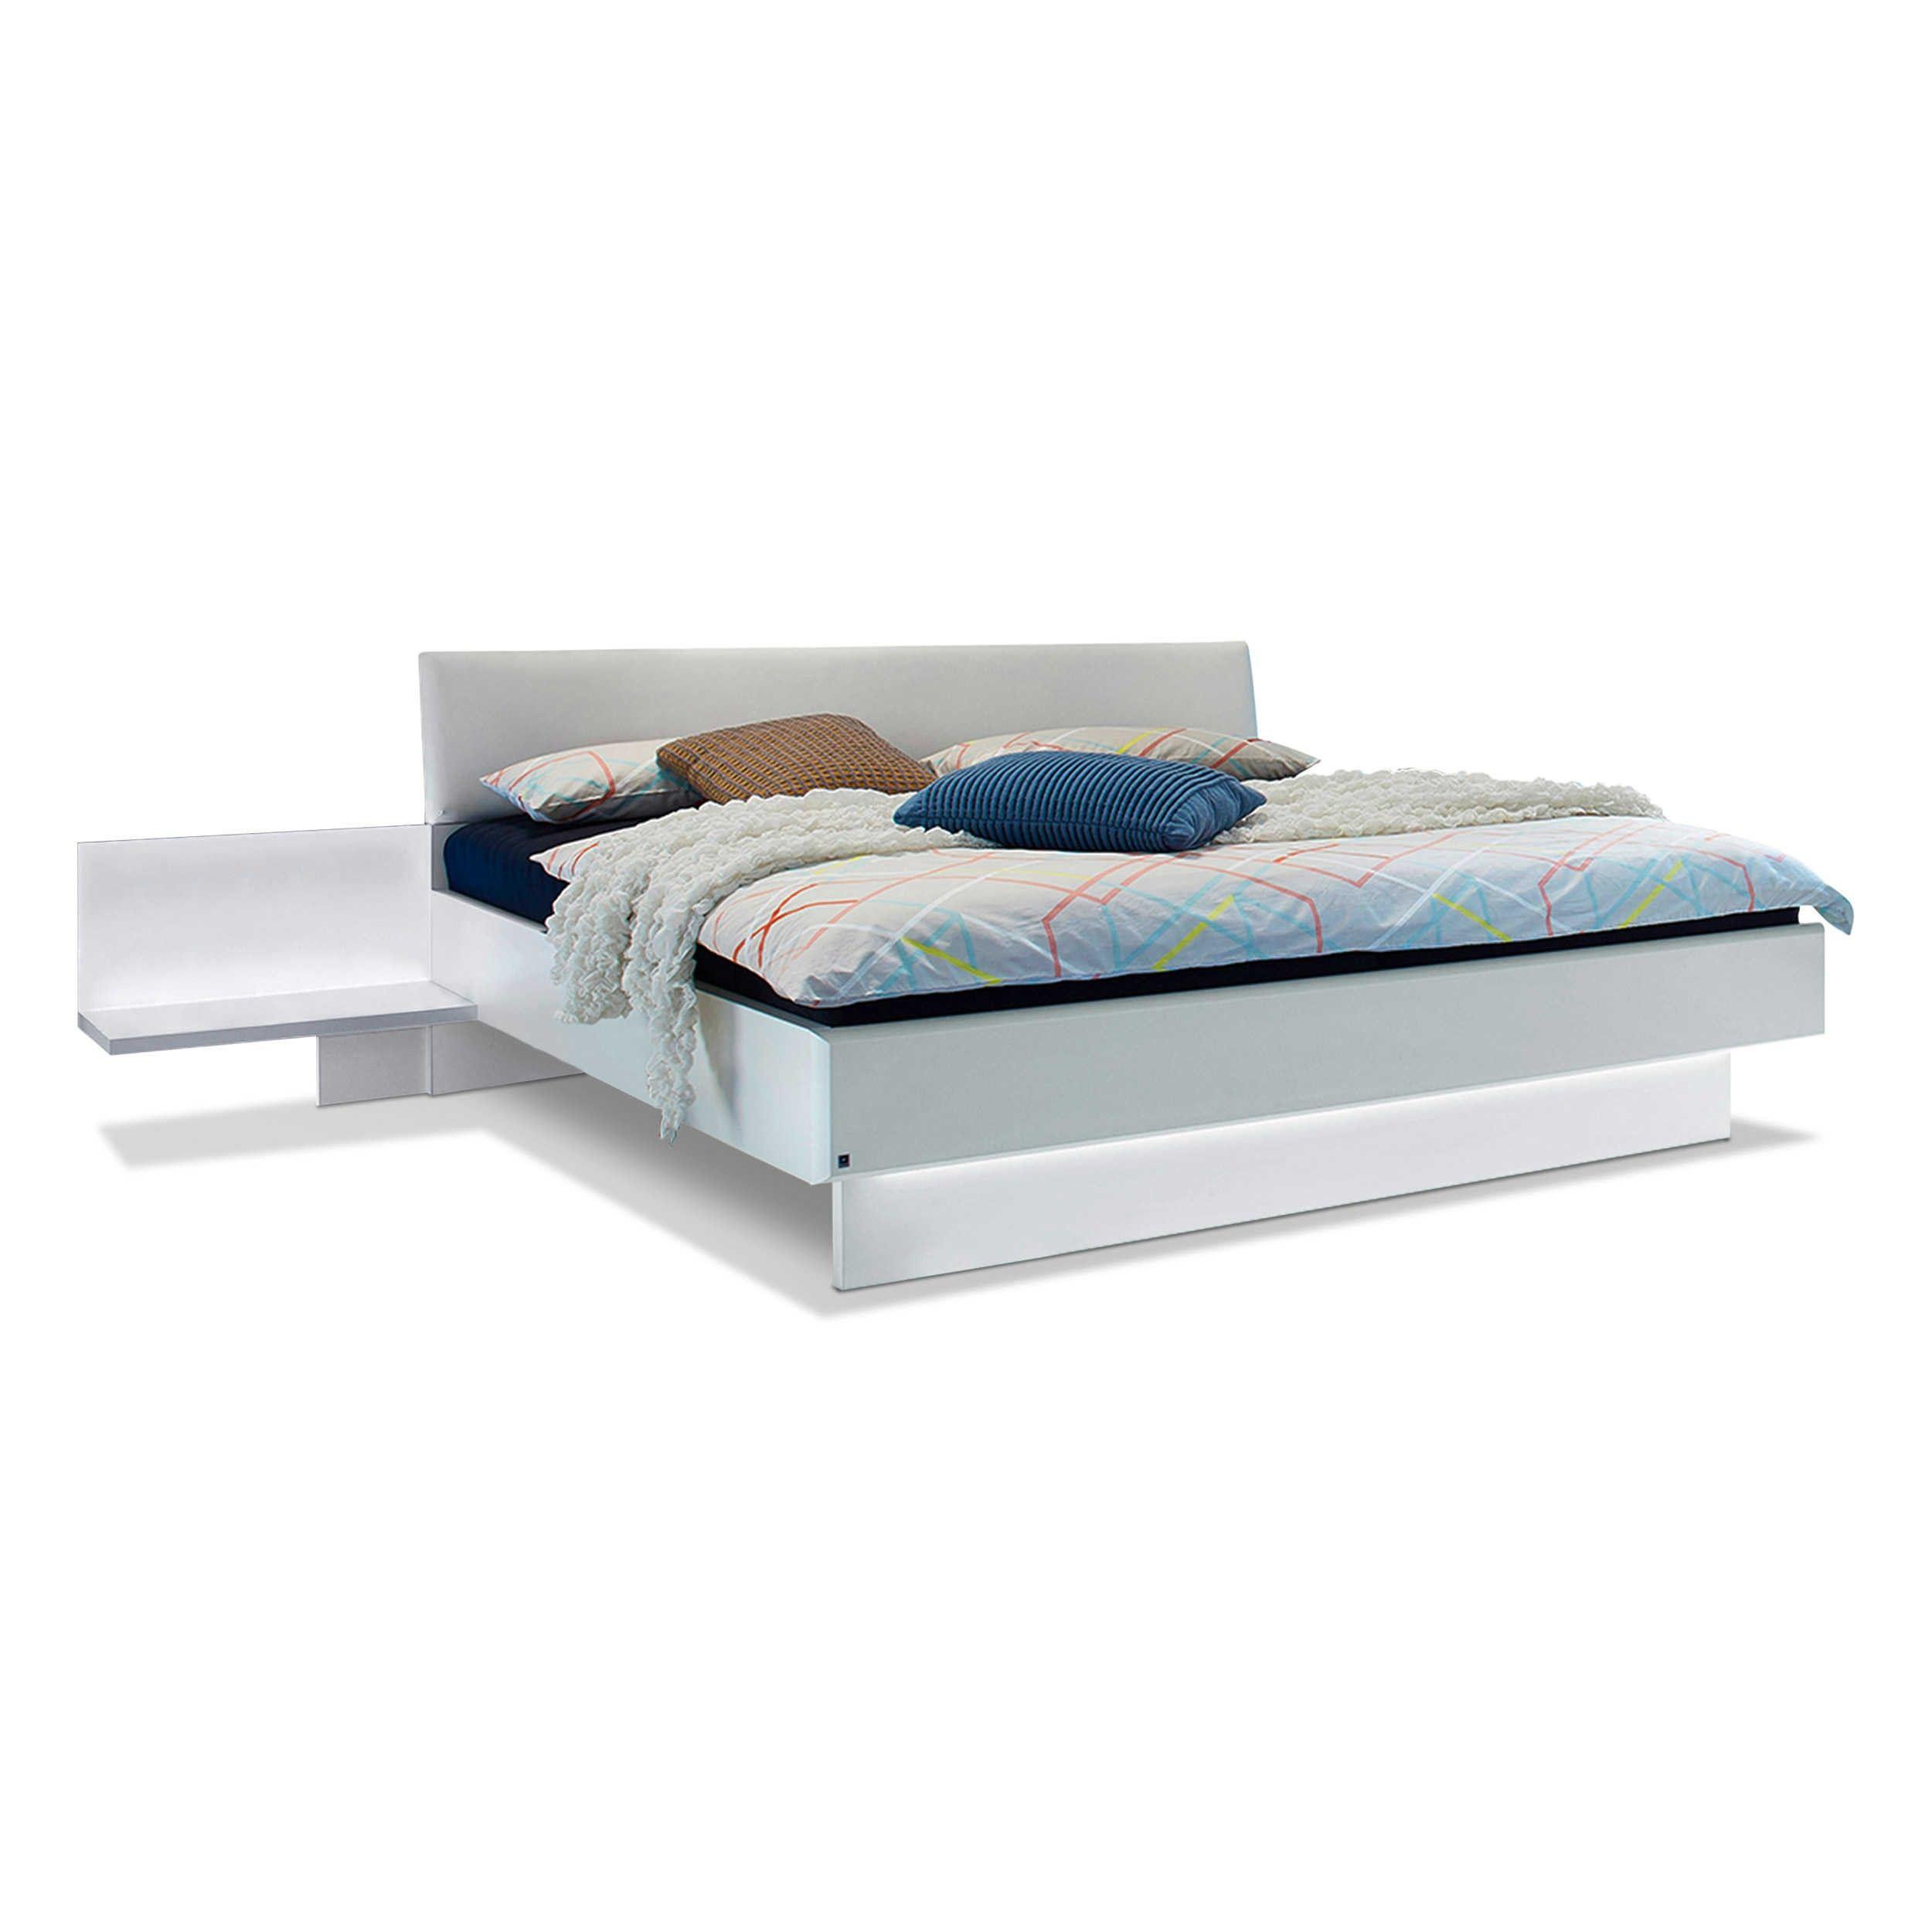 Leonardo Living Bett Mit Nachttischen Dream 160 X 200 Cm A Weiss